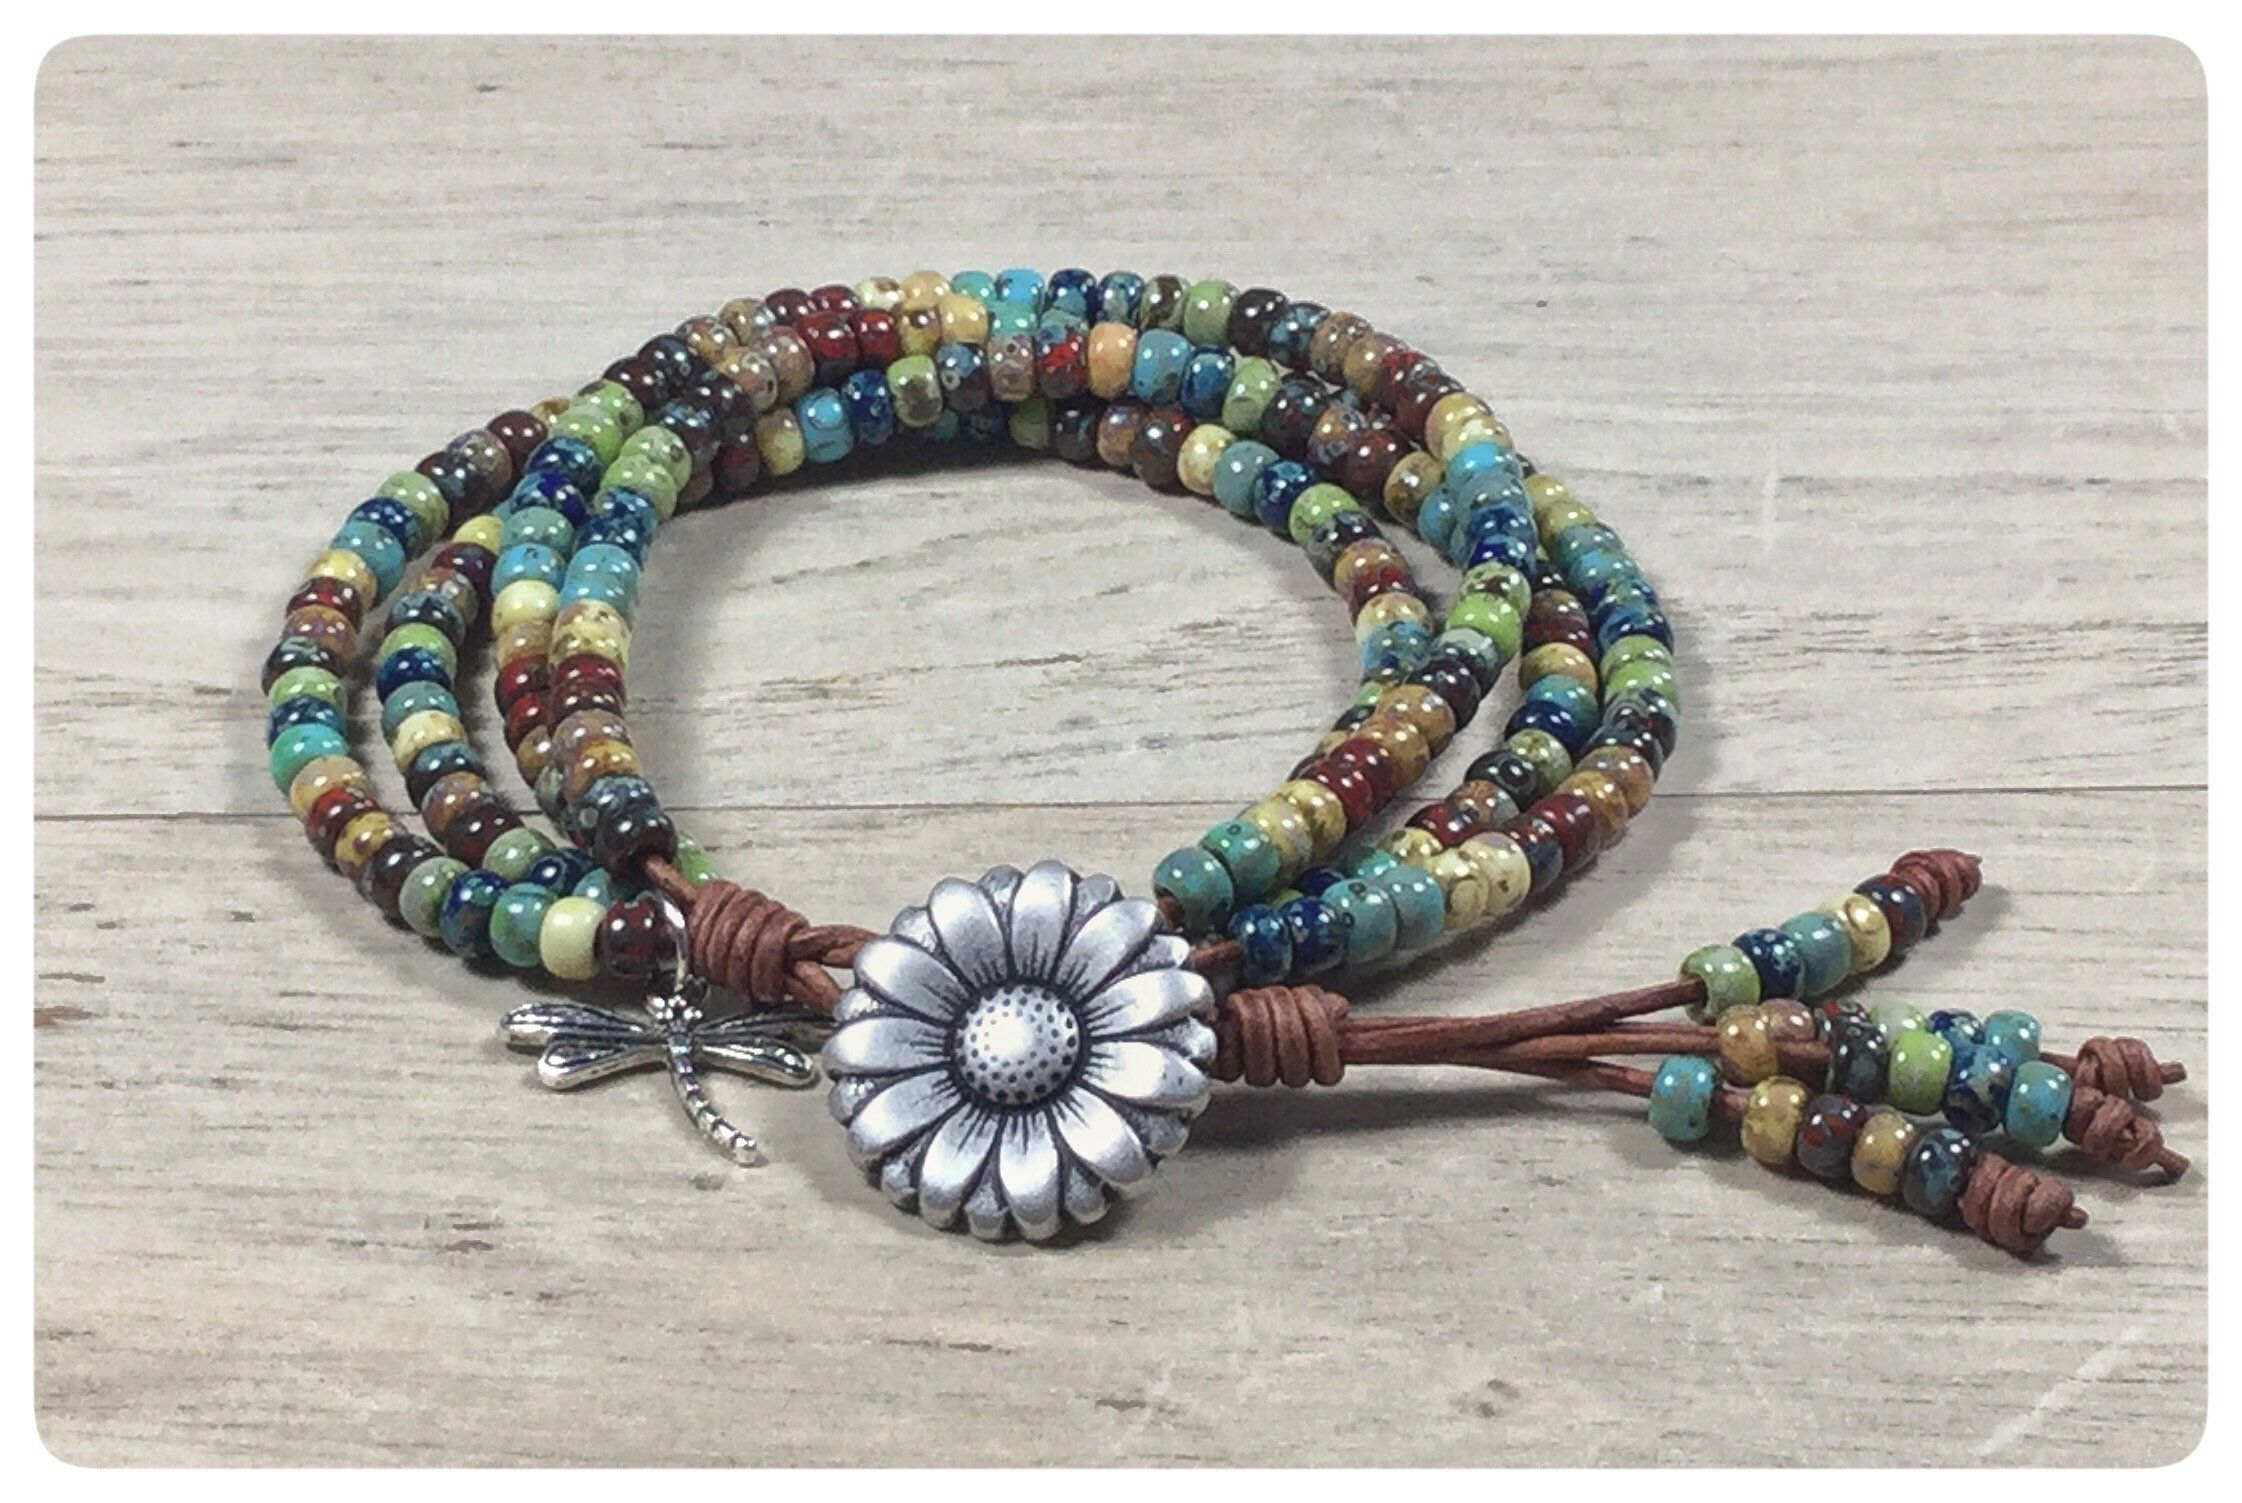 Beaded leather wrap bracelets for women colorful leather boho